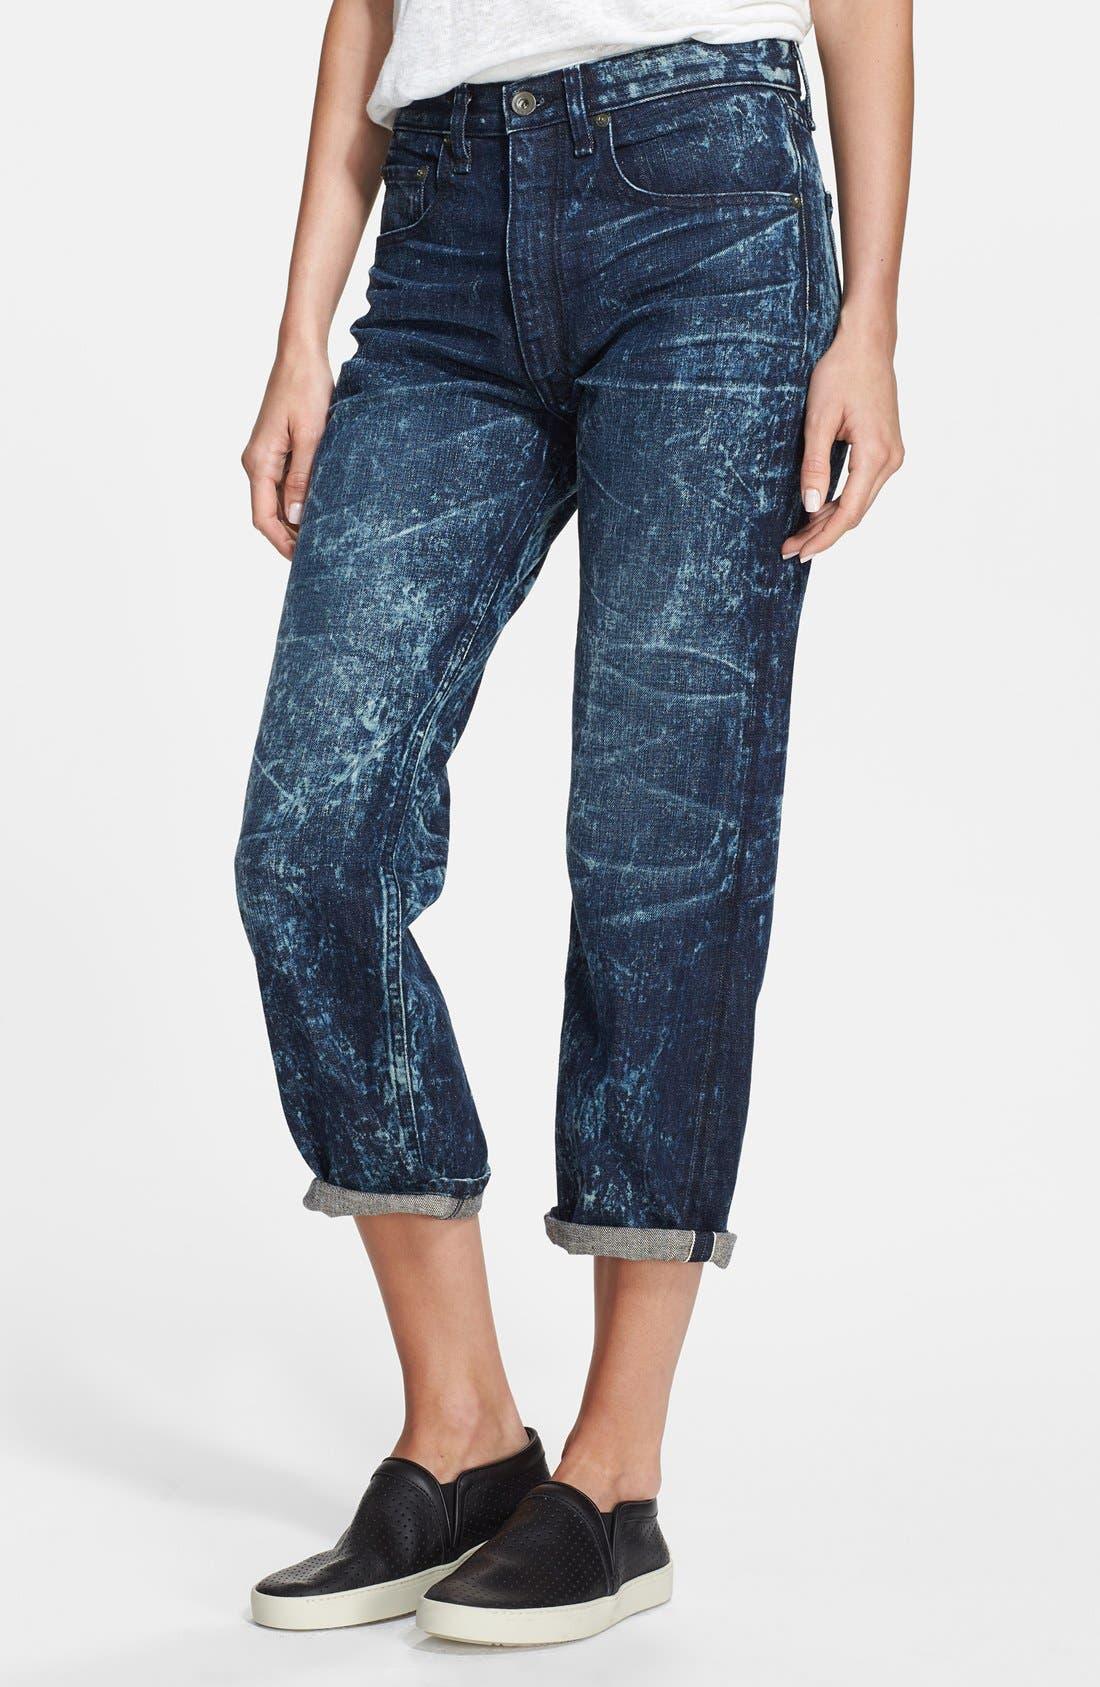 JEAN 'Marilyn' Crop Jeans,                             Main thumbnail 1, color,                             400